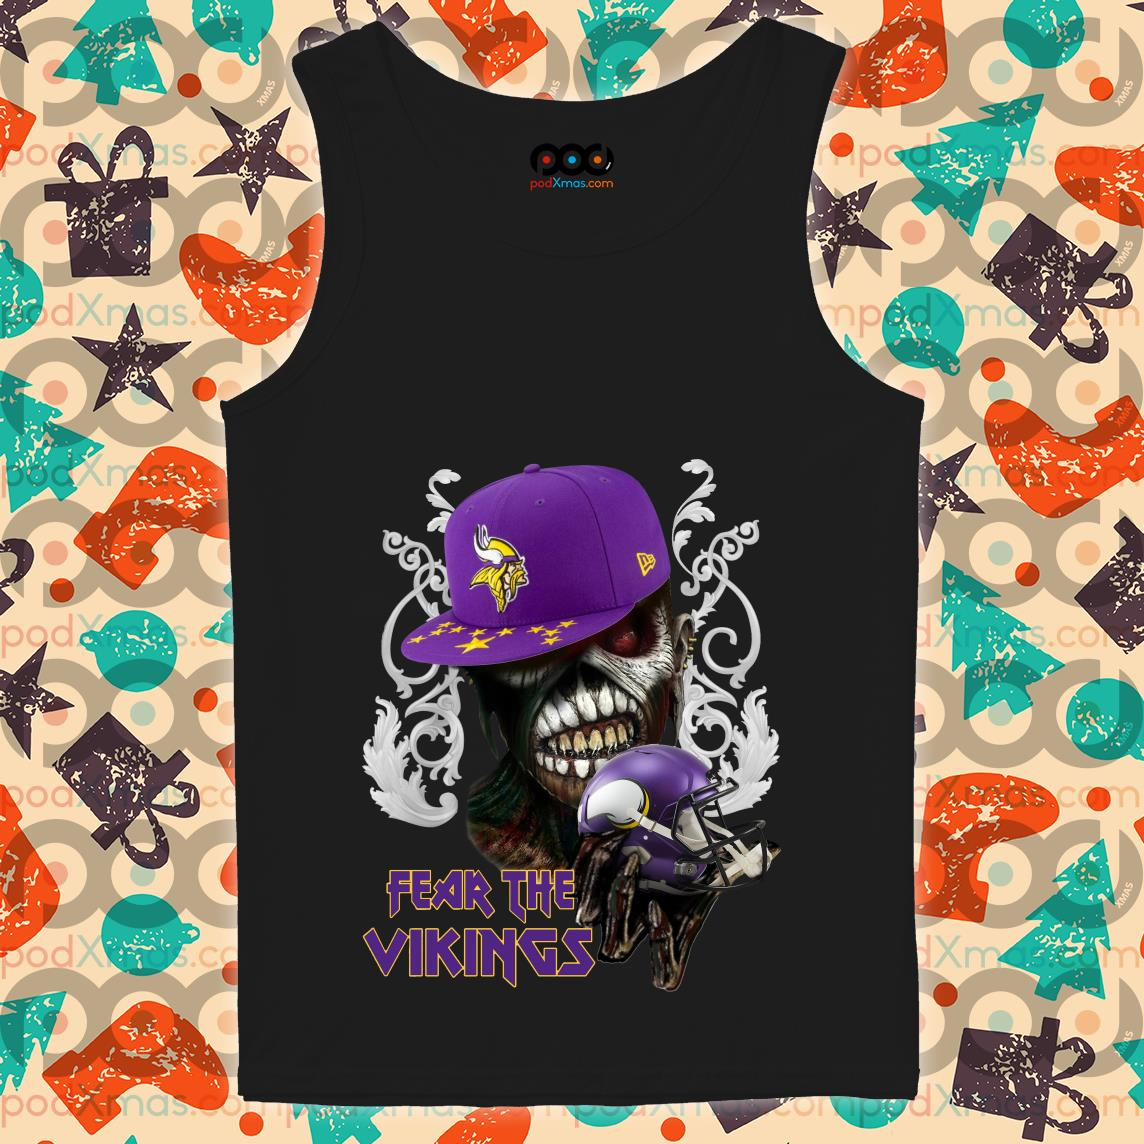 Iron Maiden Eddie Fear the Vikings tank top